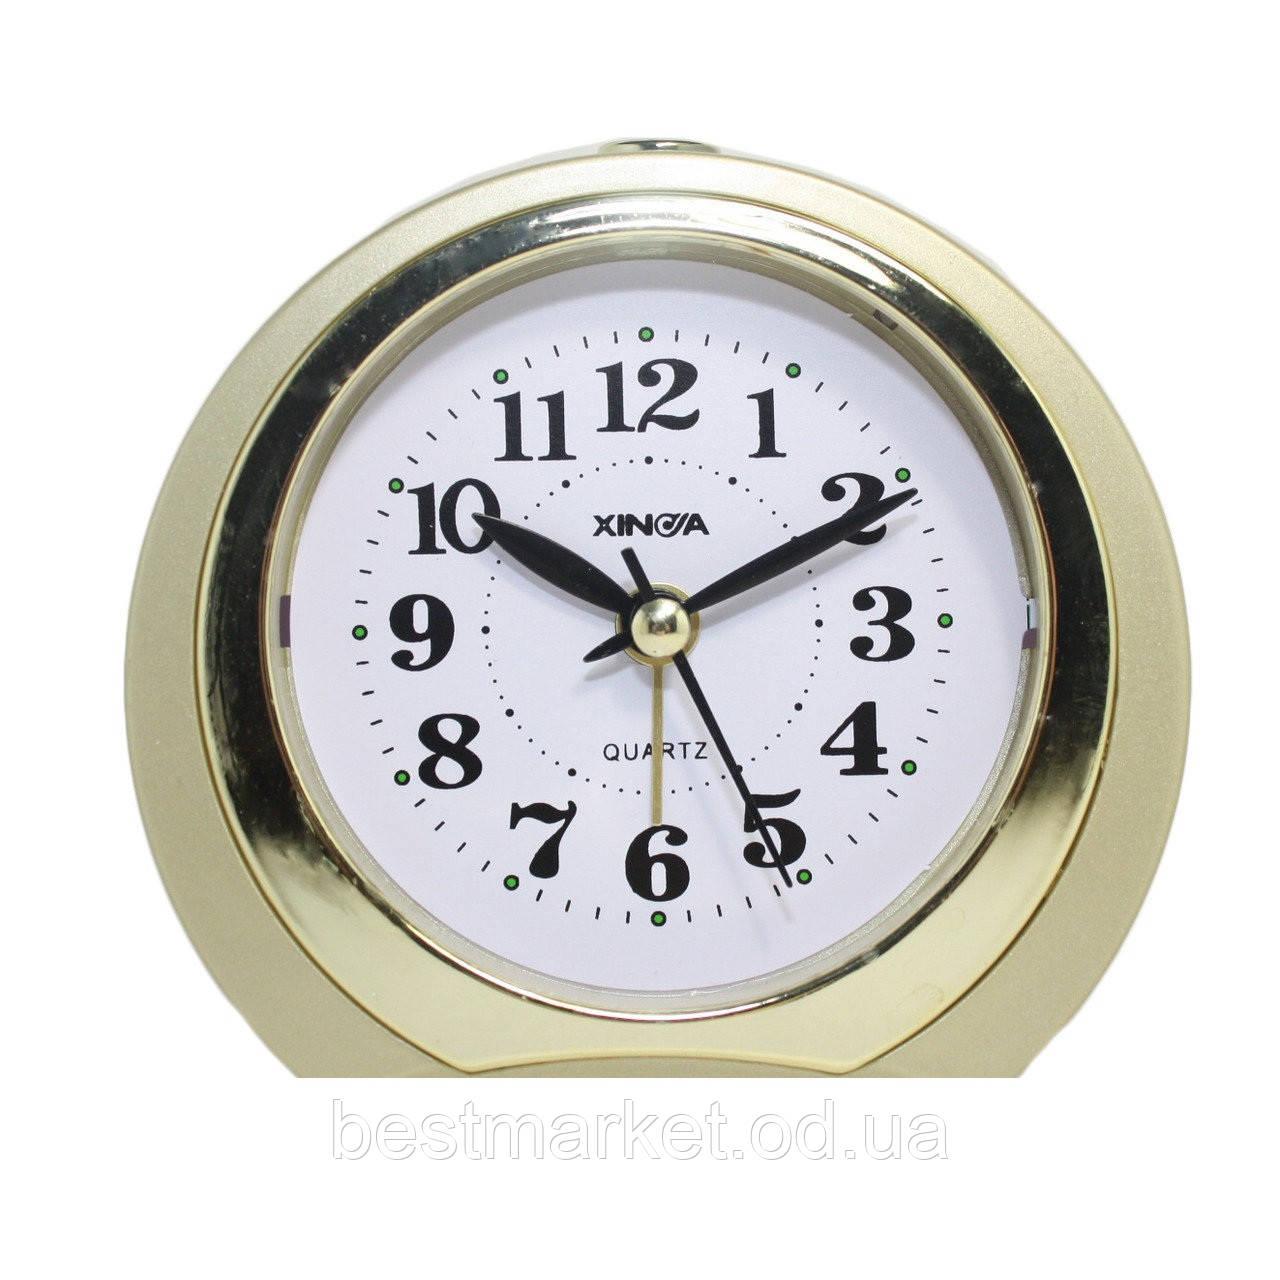 Годинник - Будильник XD788